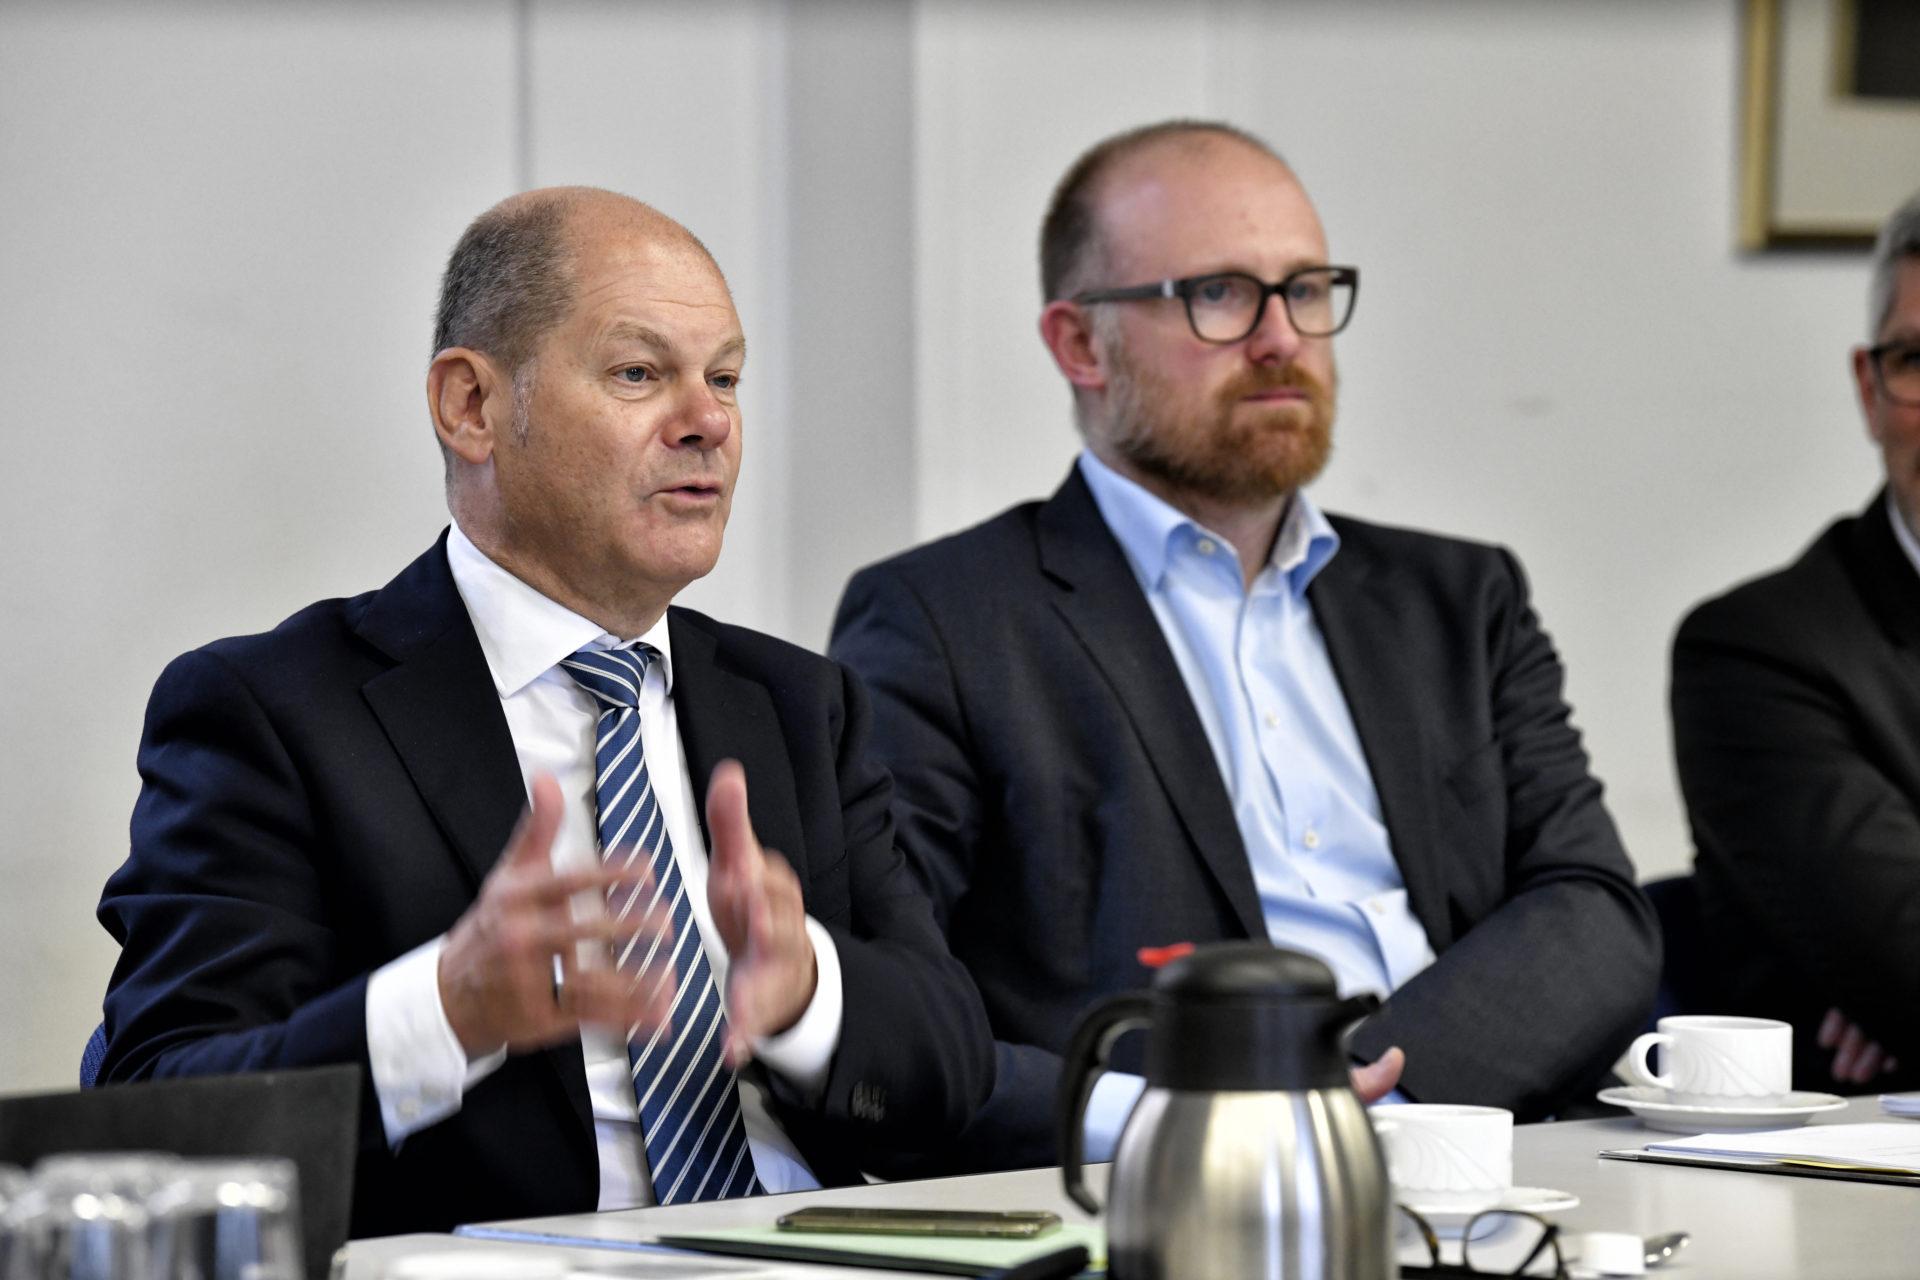 Olat Scholz, Bundesfinanzminister